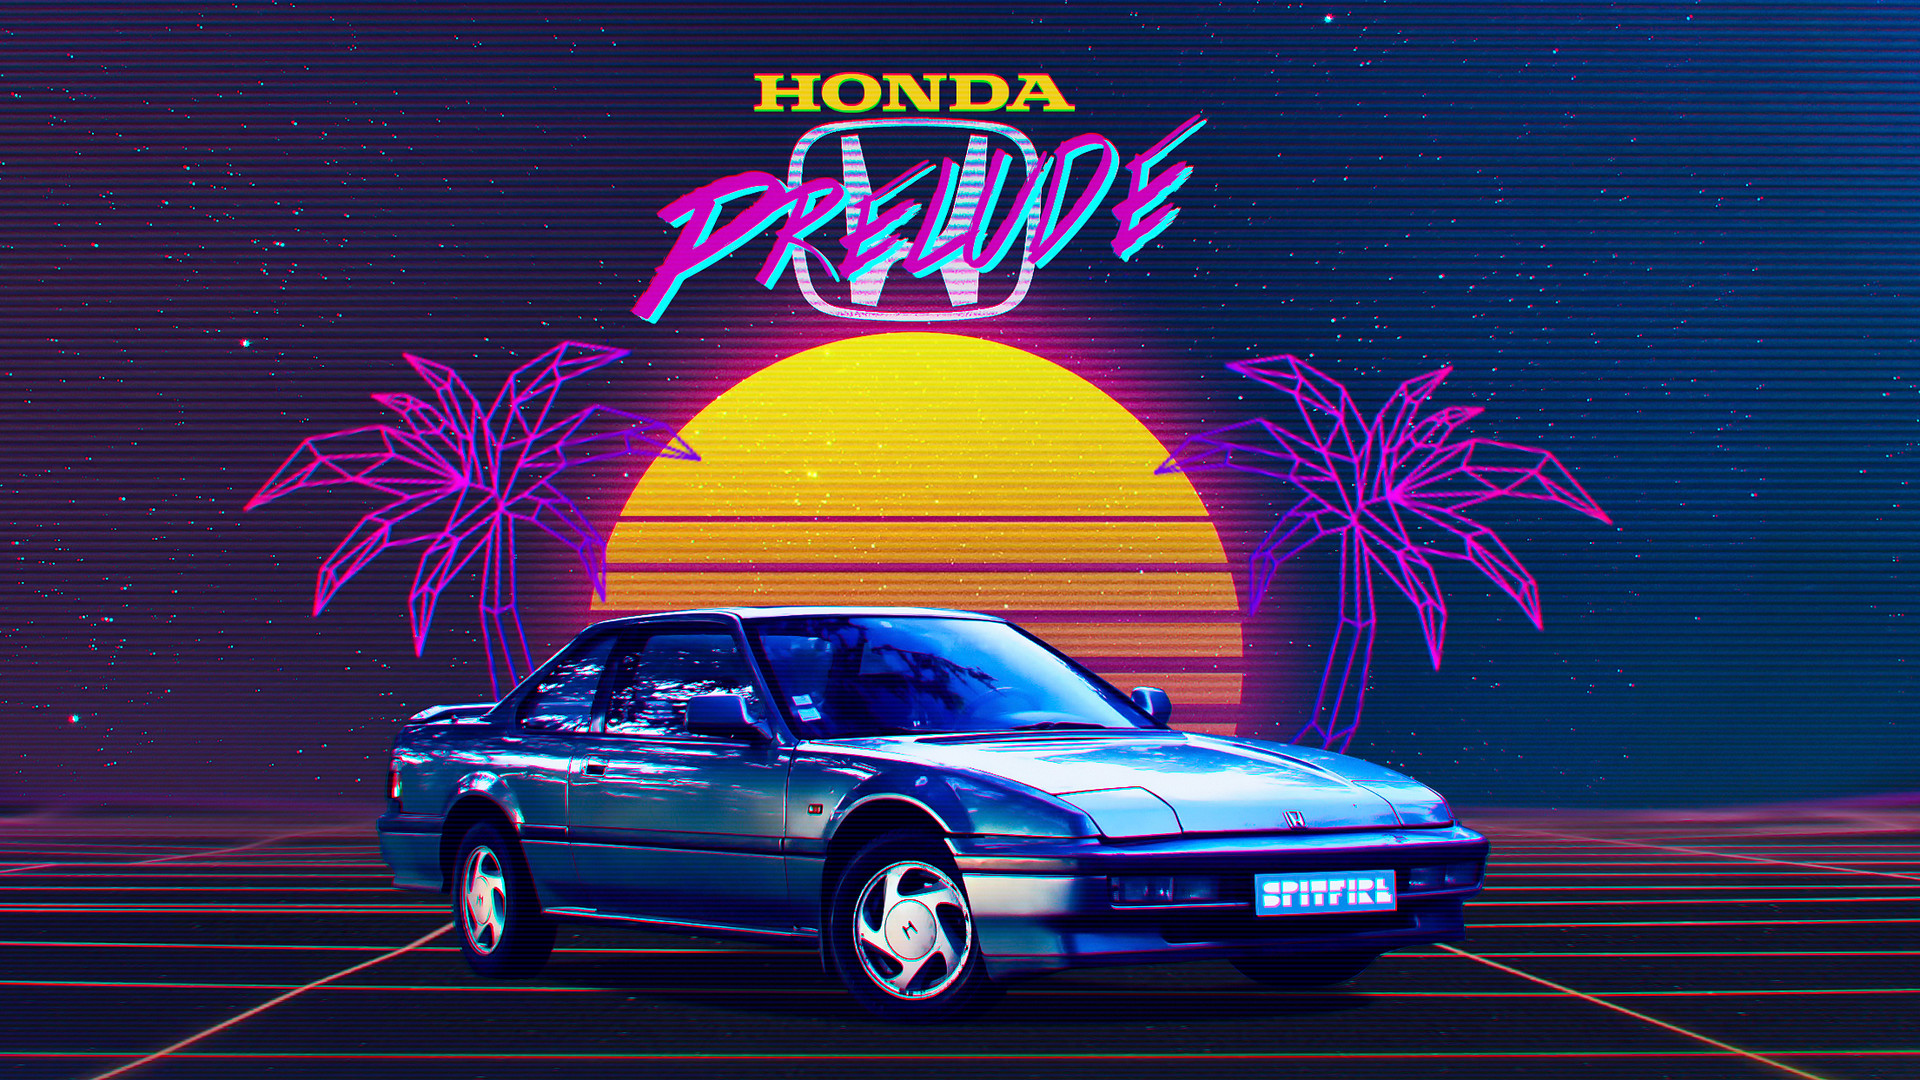 Drift Car Wallpaper Hd Artstation Honda Prelude 80 S Retrowave Pierre Collin